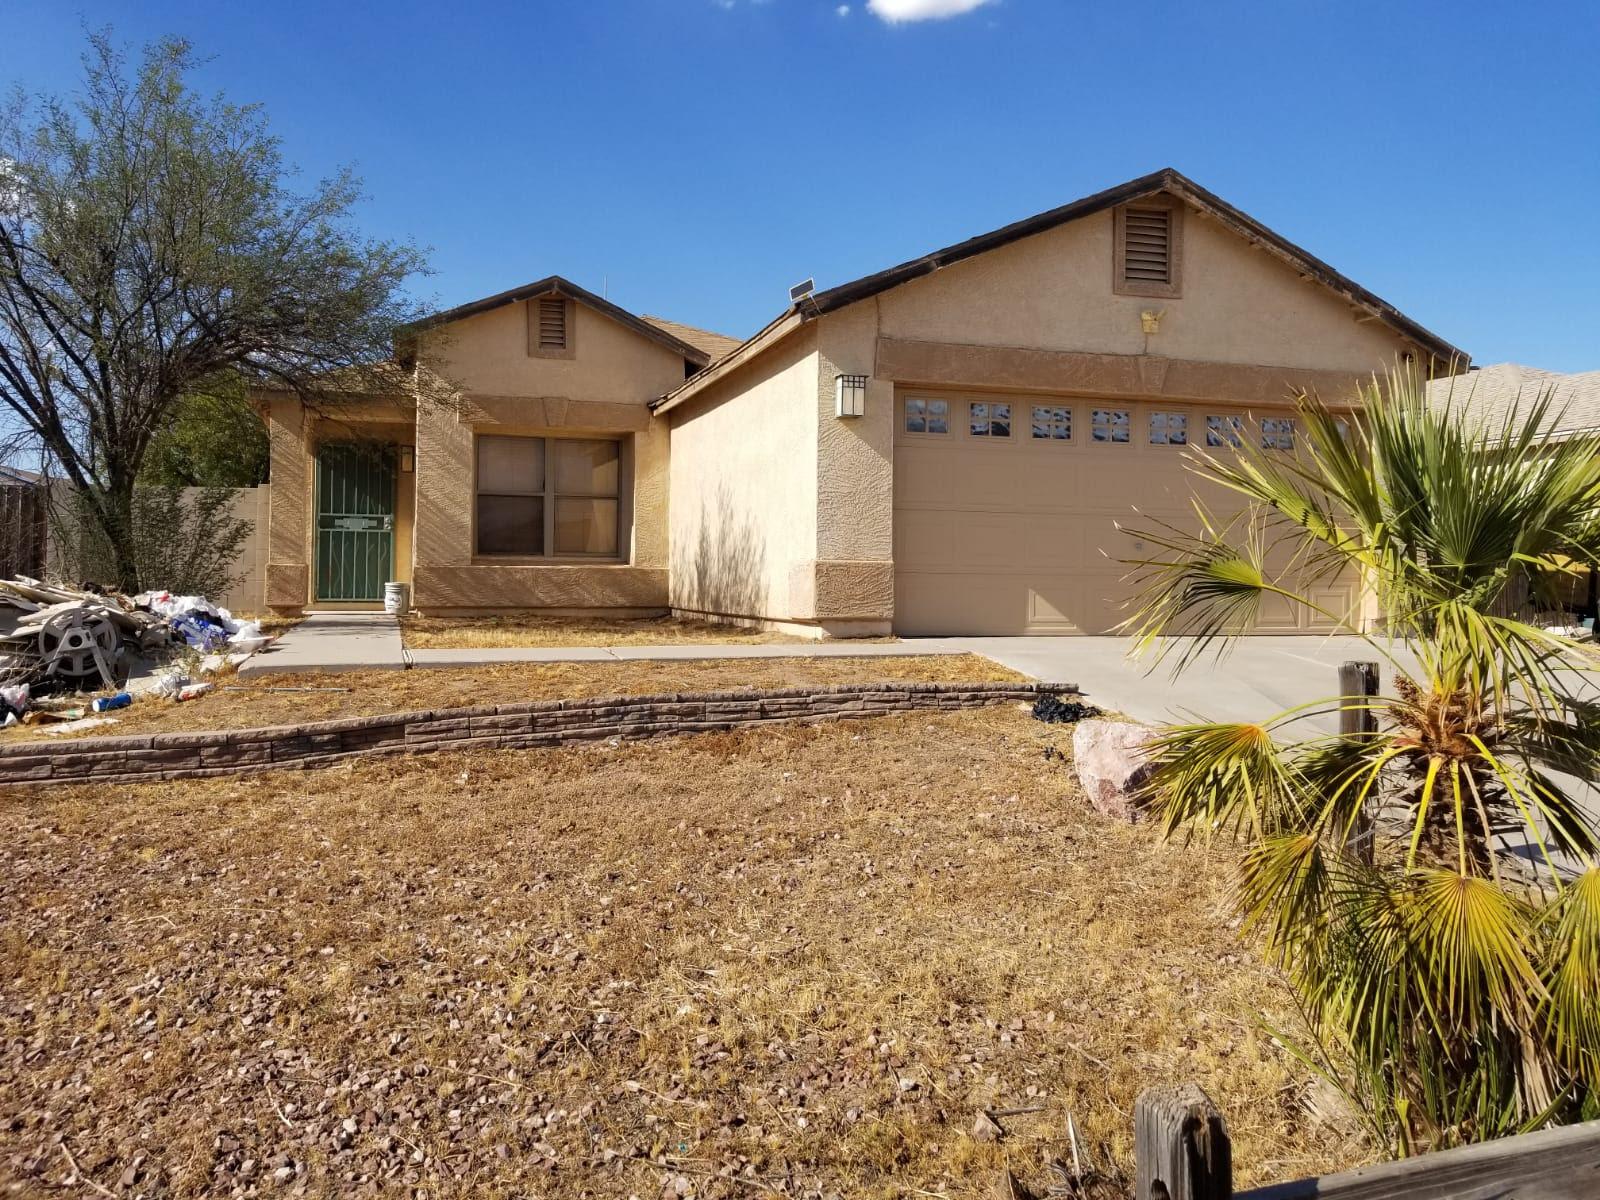 11752 W Cabrillo Dr, Arizona City, AZ 85123 wholesale property listing